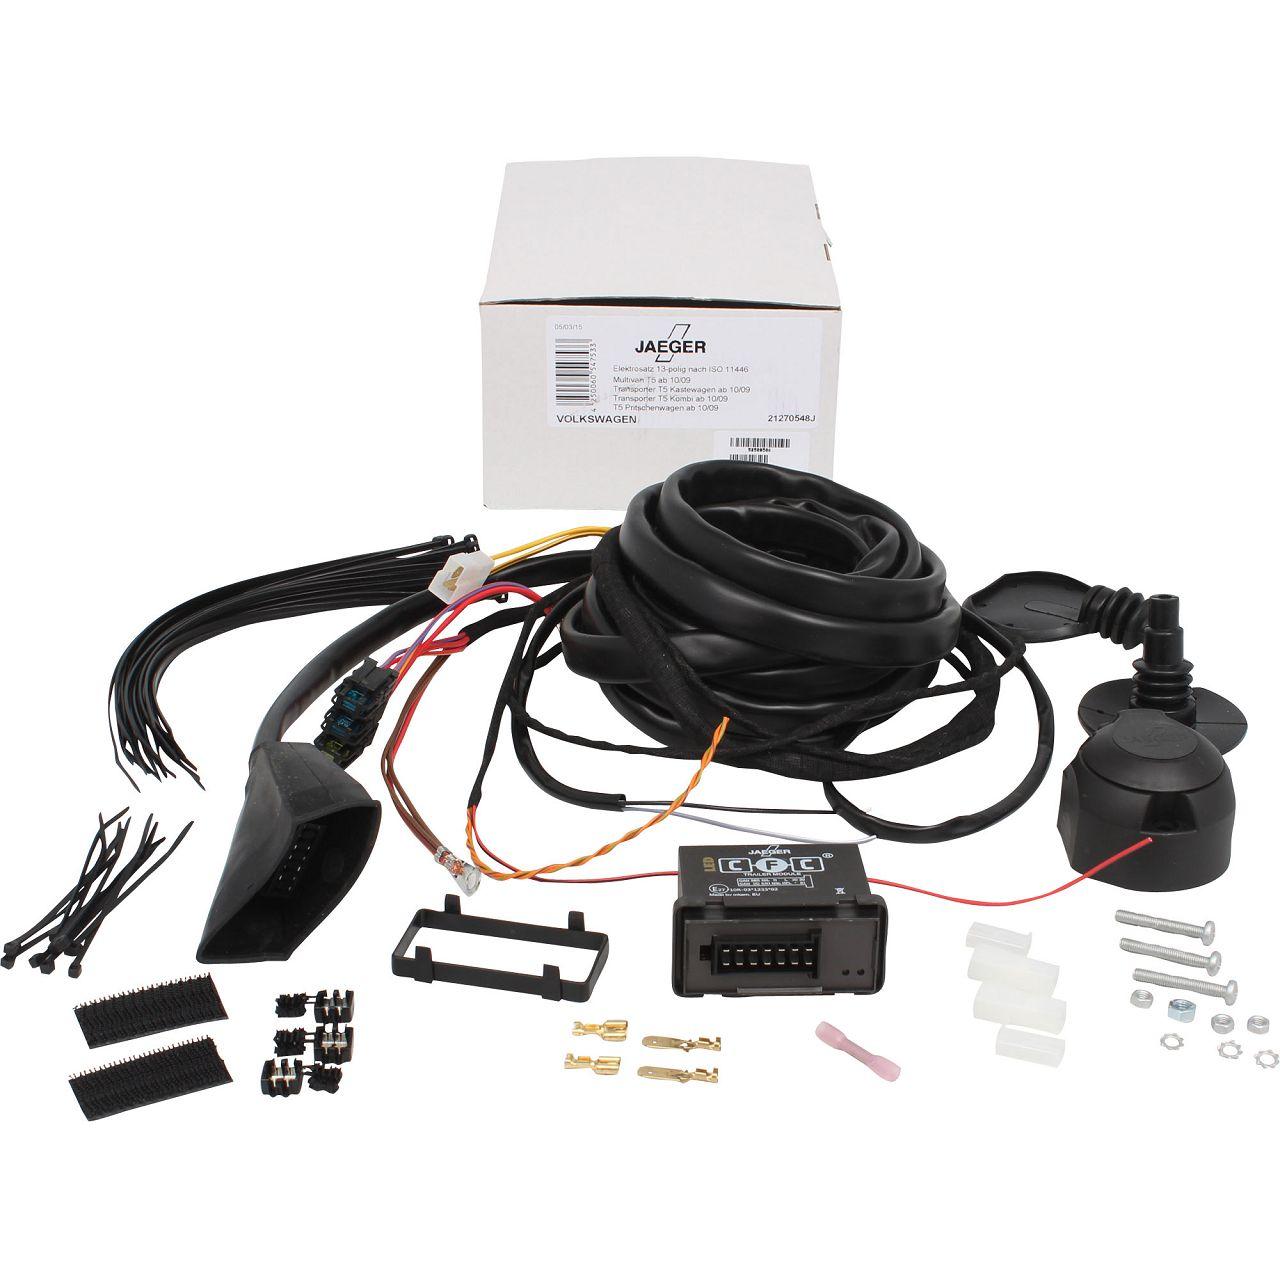 JAEGER Kabelsatz E-Satz Anhängerkupplung VW Multivan Transporter T5 T6 bis 10.2019